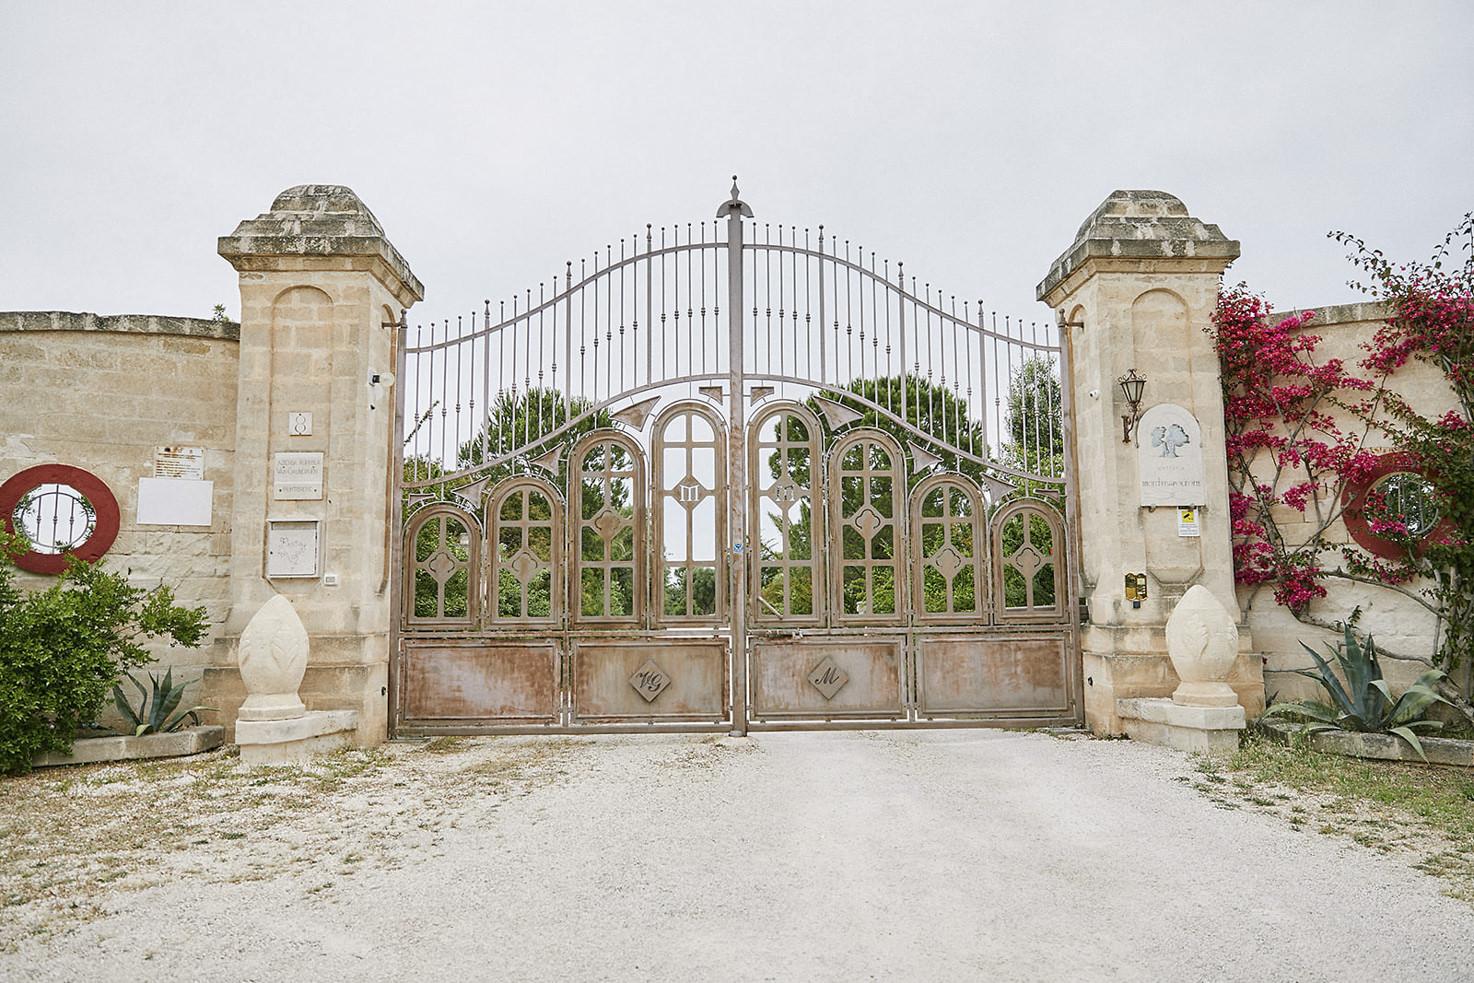 Gateway to the Masseria